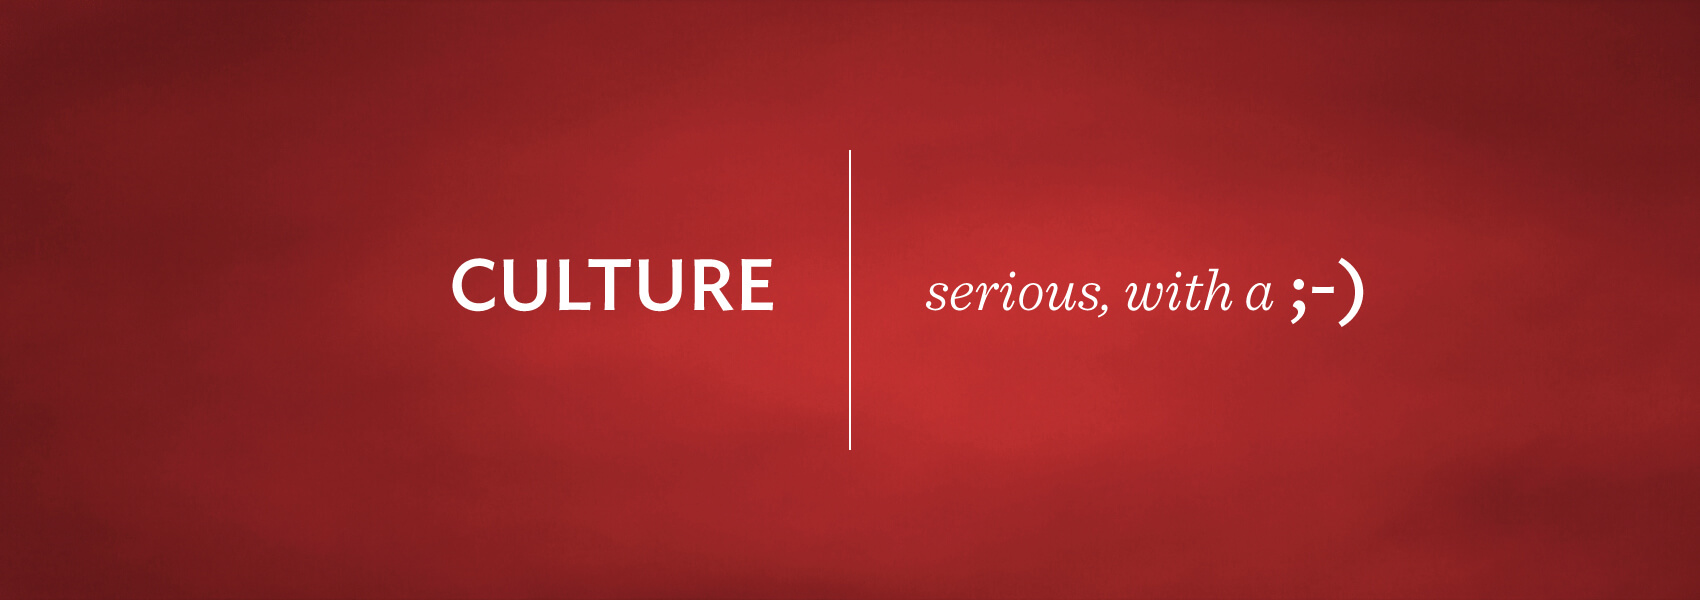 Merlot Marketing Culture